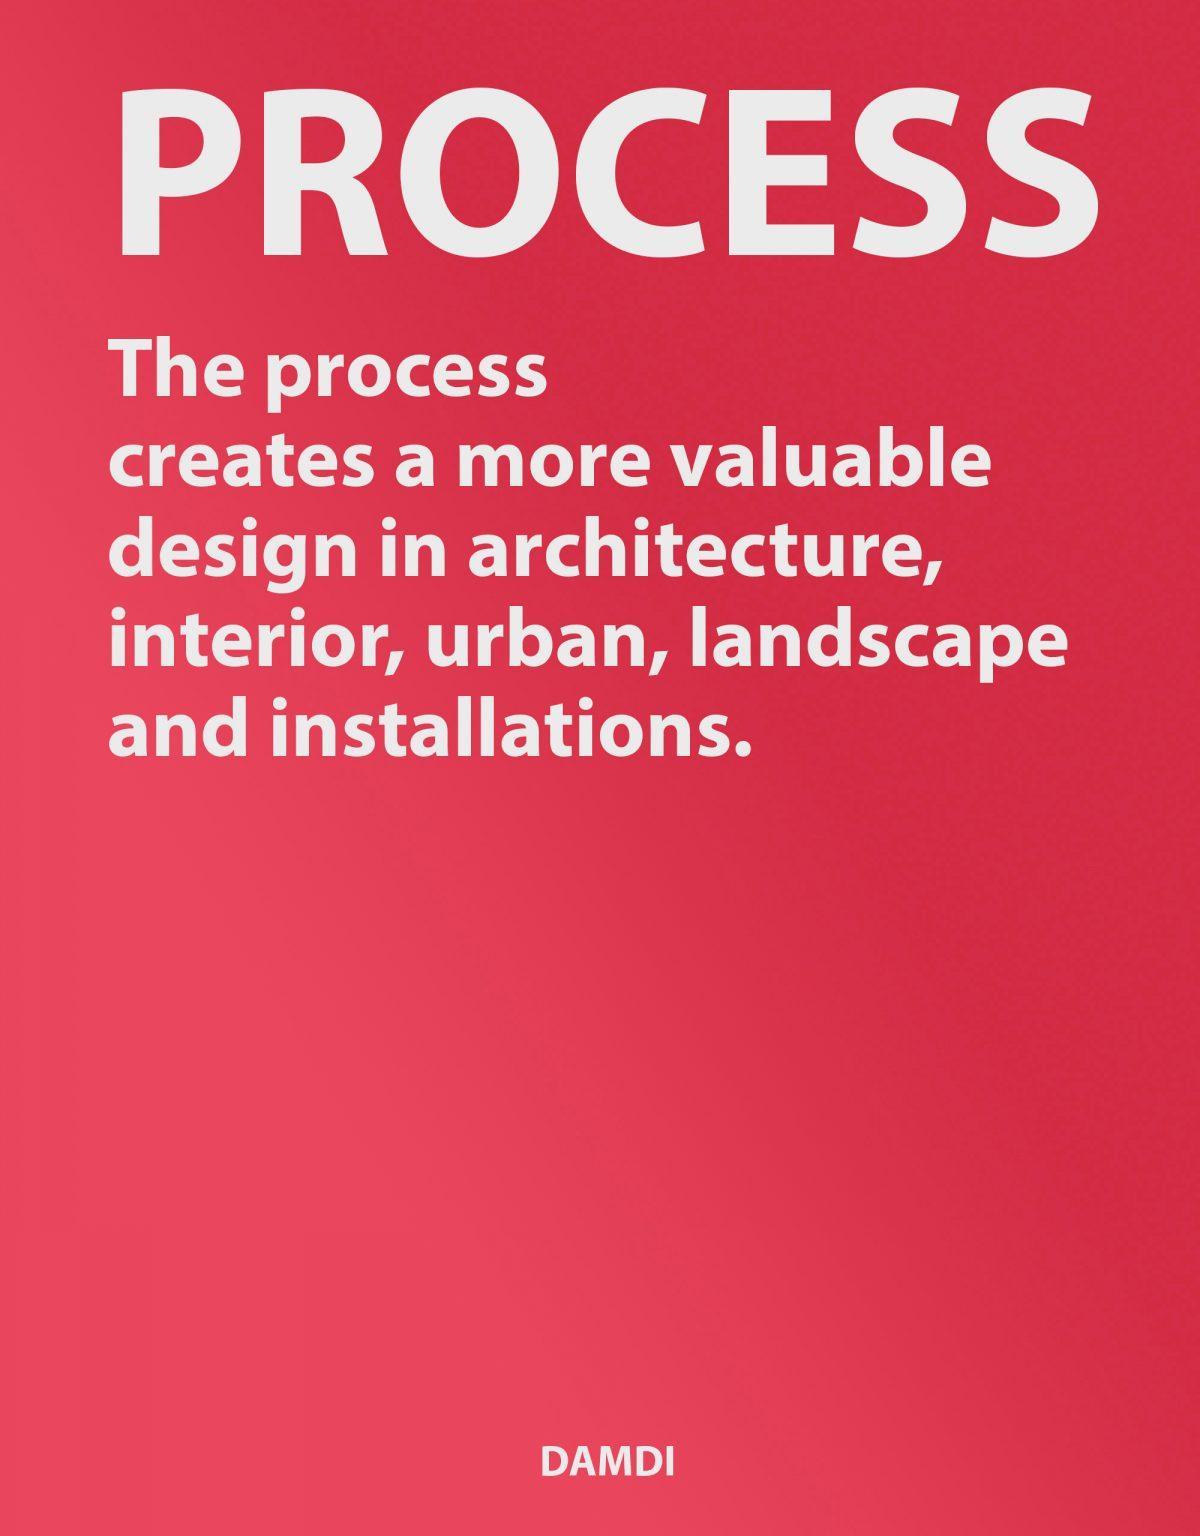 damdi_process_2013